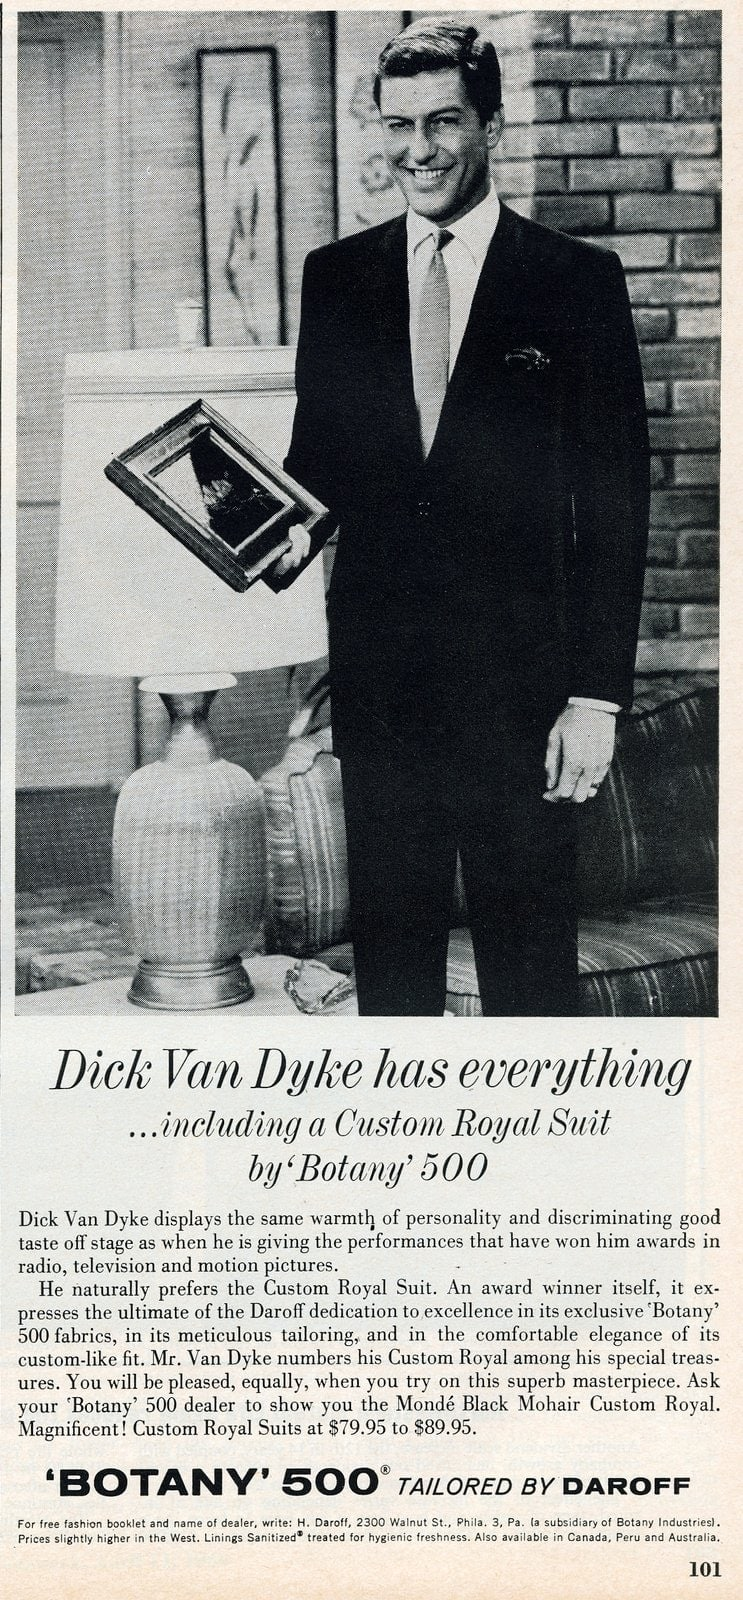 1956 - Dick Van Dyke for Botany 500 suits